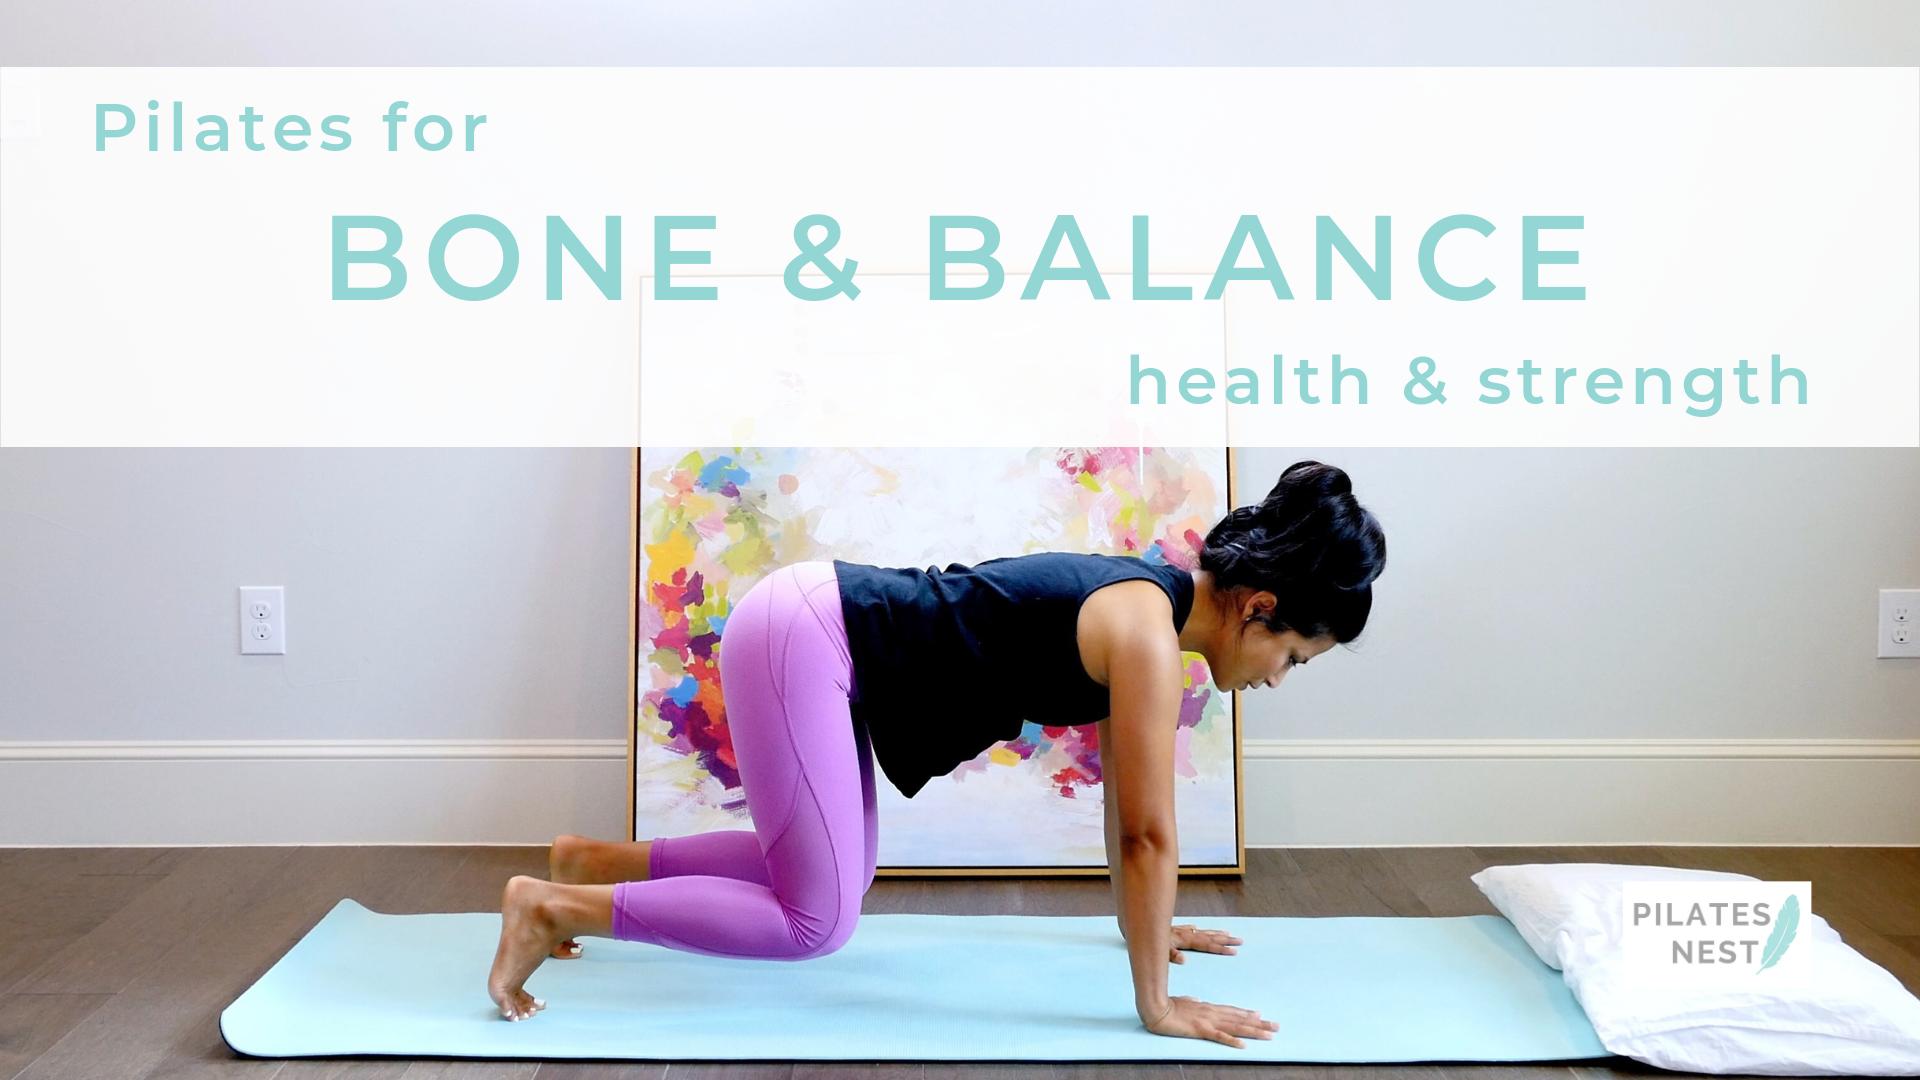 Pilates+for+Bone+&+Balance+Health+&+Strength - Pilates Nest.png